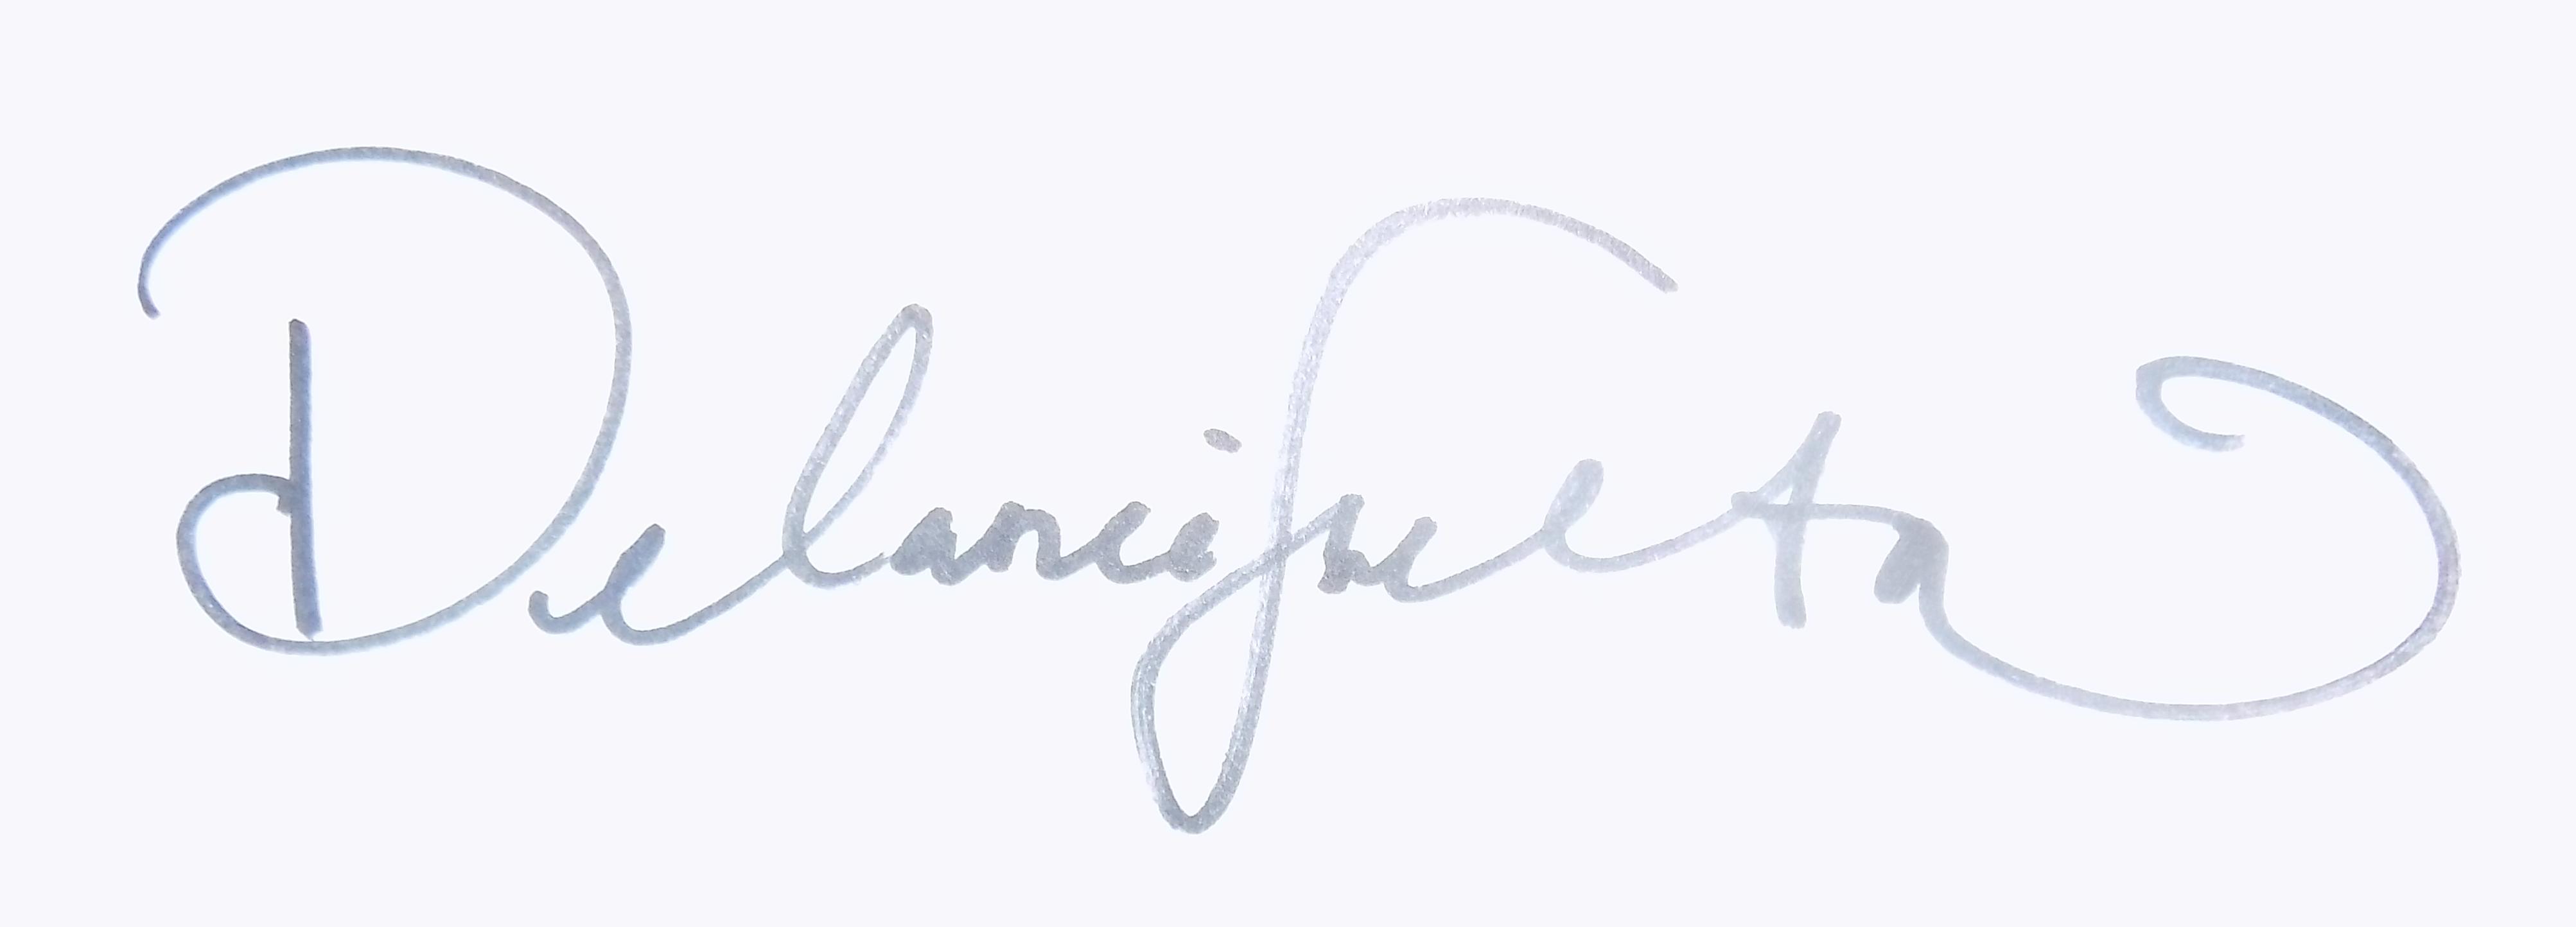 Delanie Shelton Signature